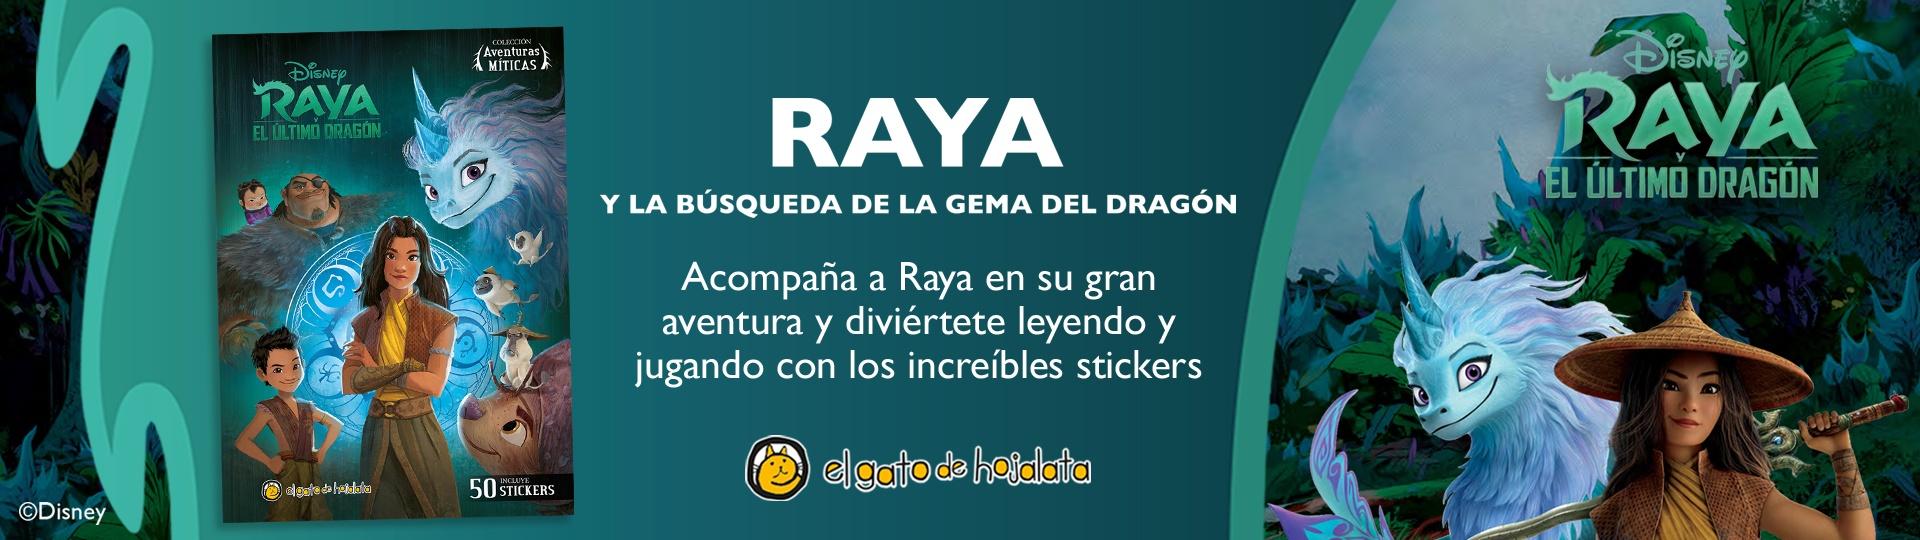 RAYA_GEMA_DRAGON_WEB_1920X540